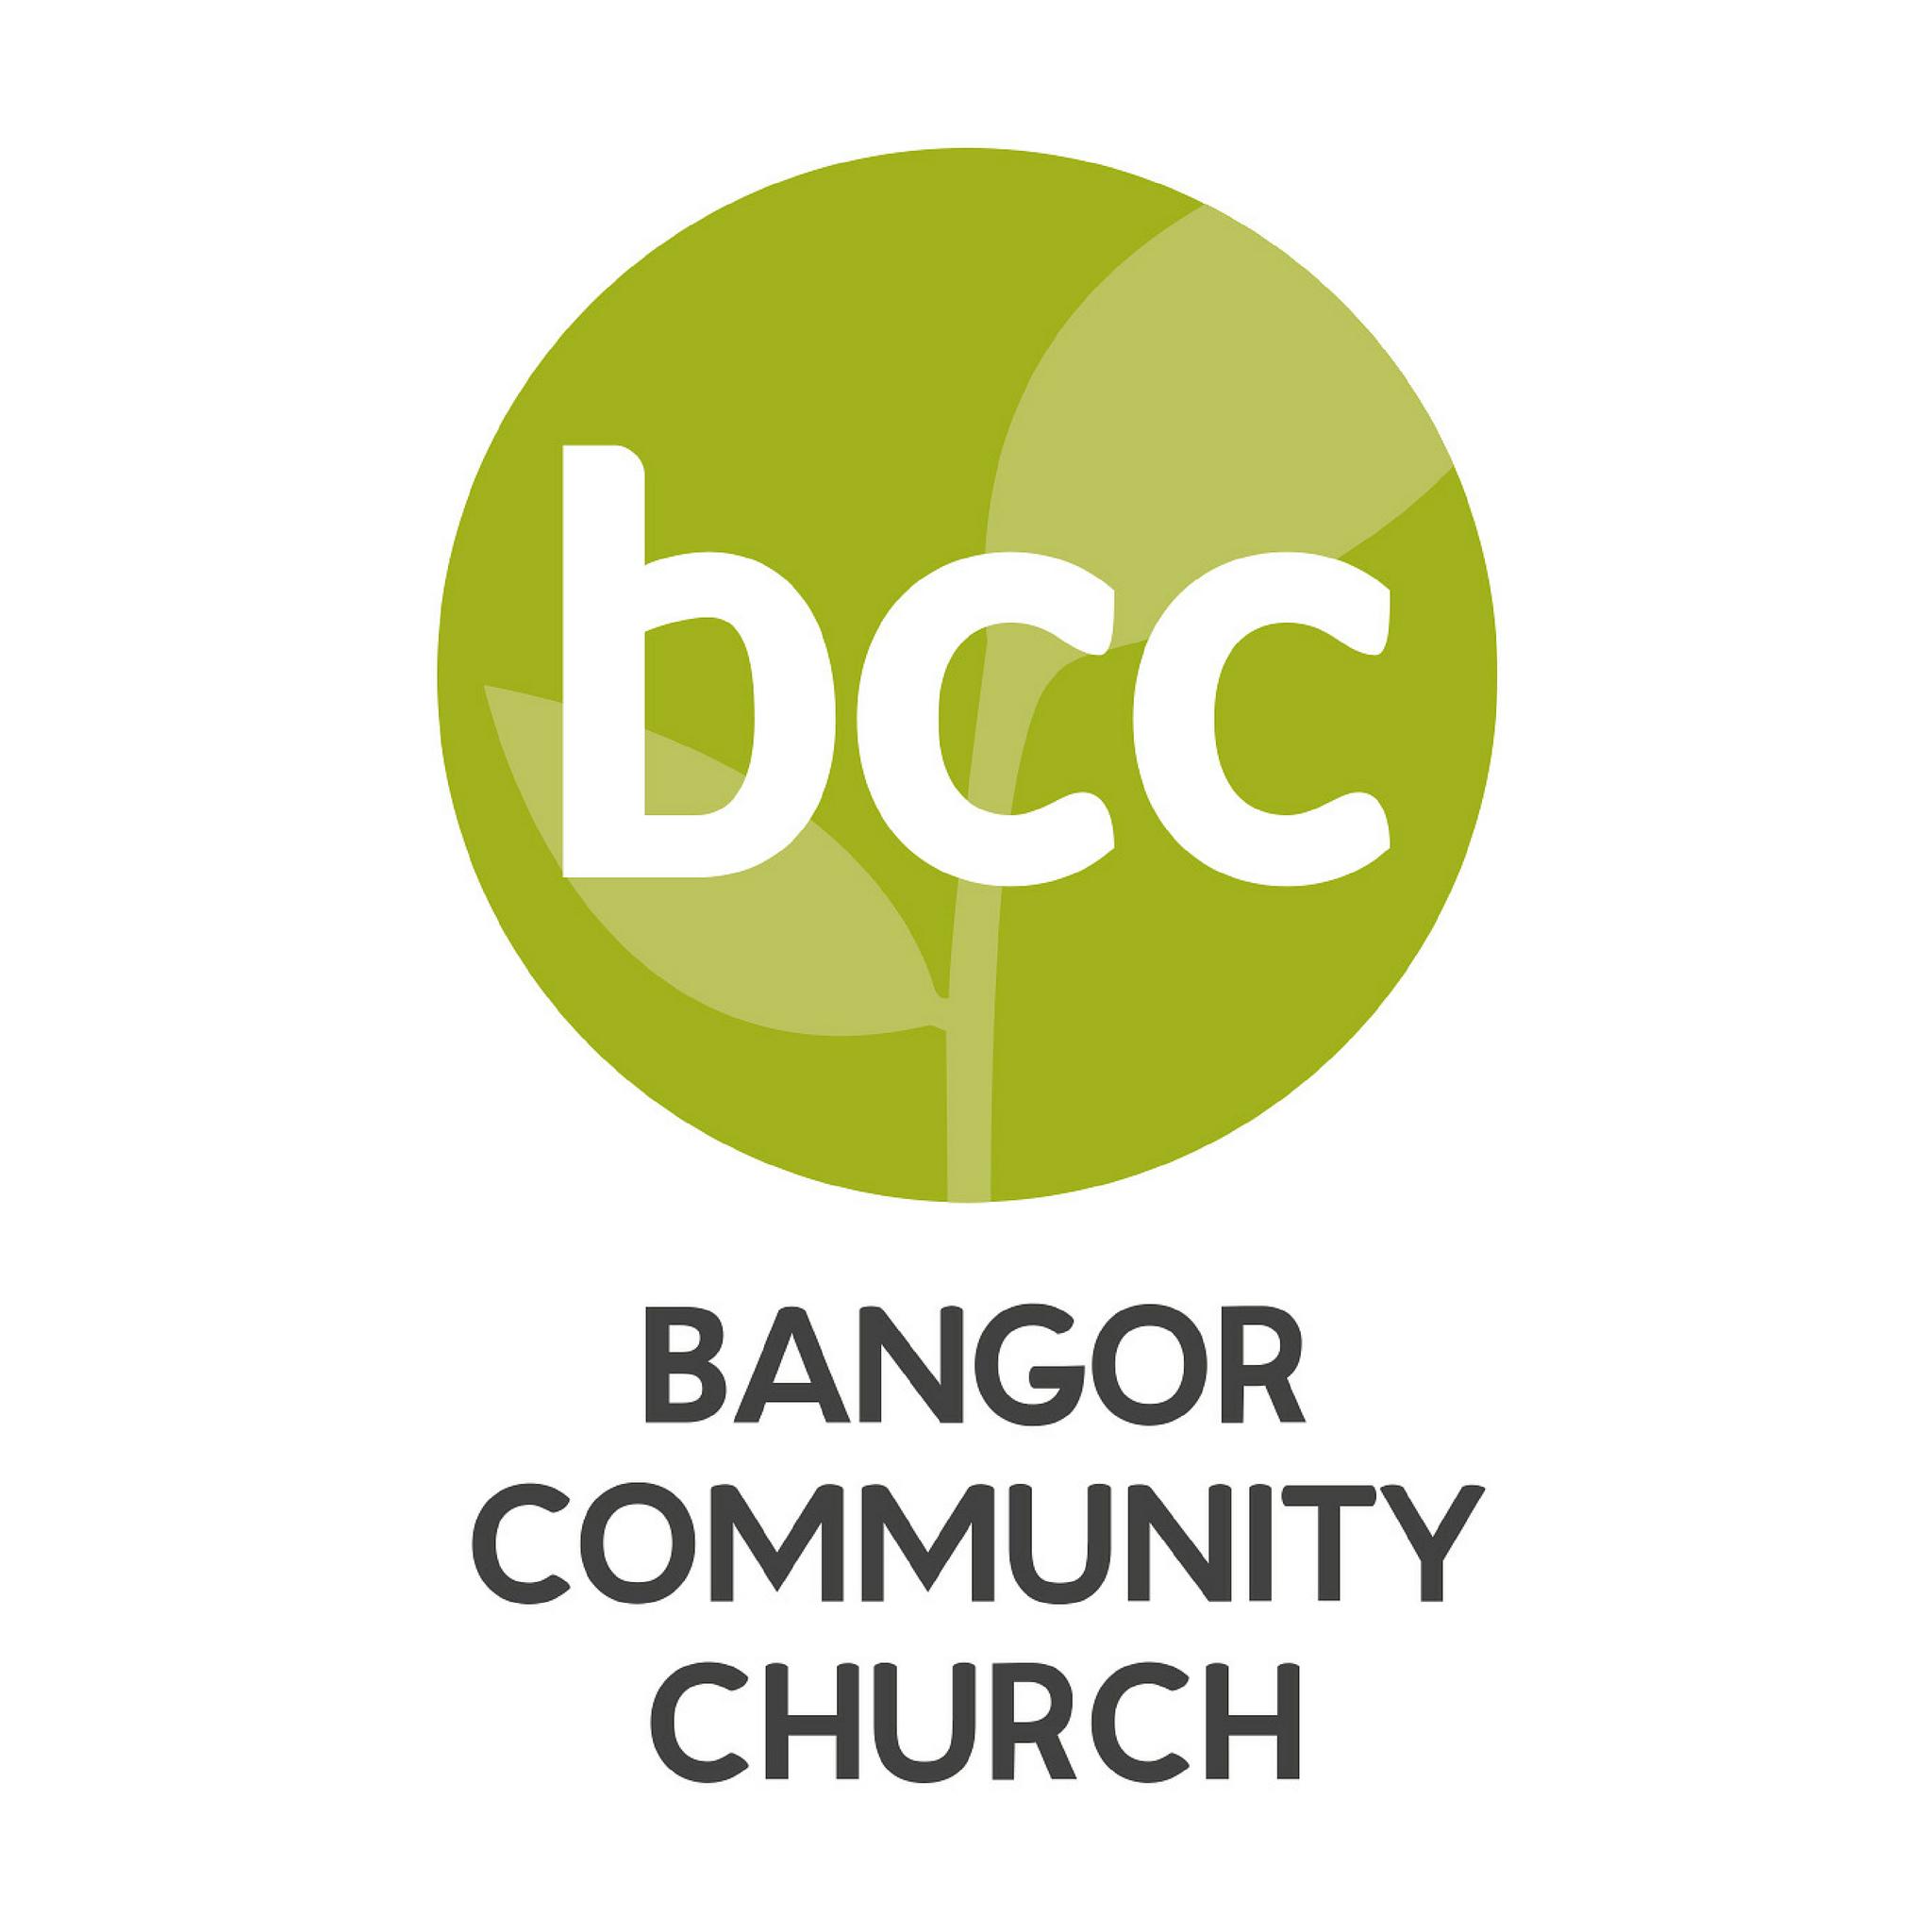 Bangor Community Church